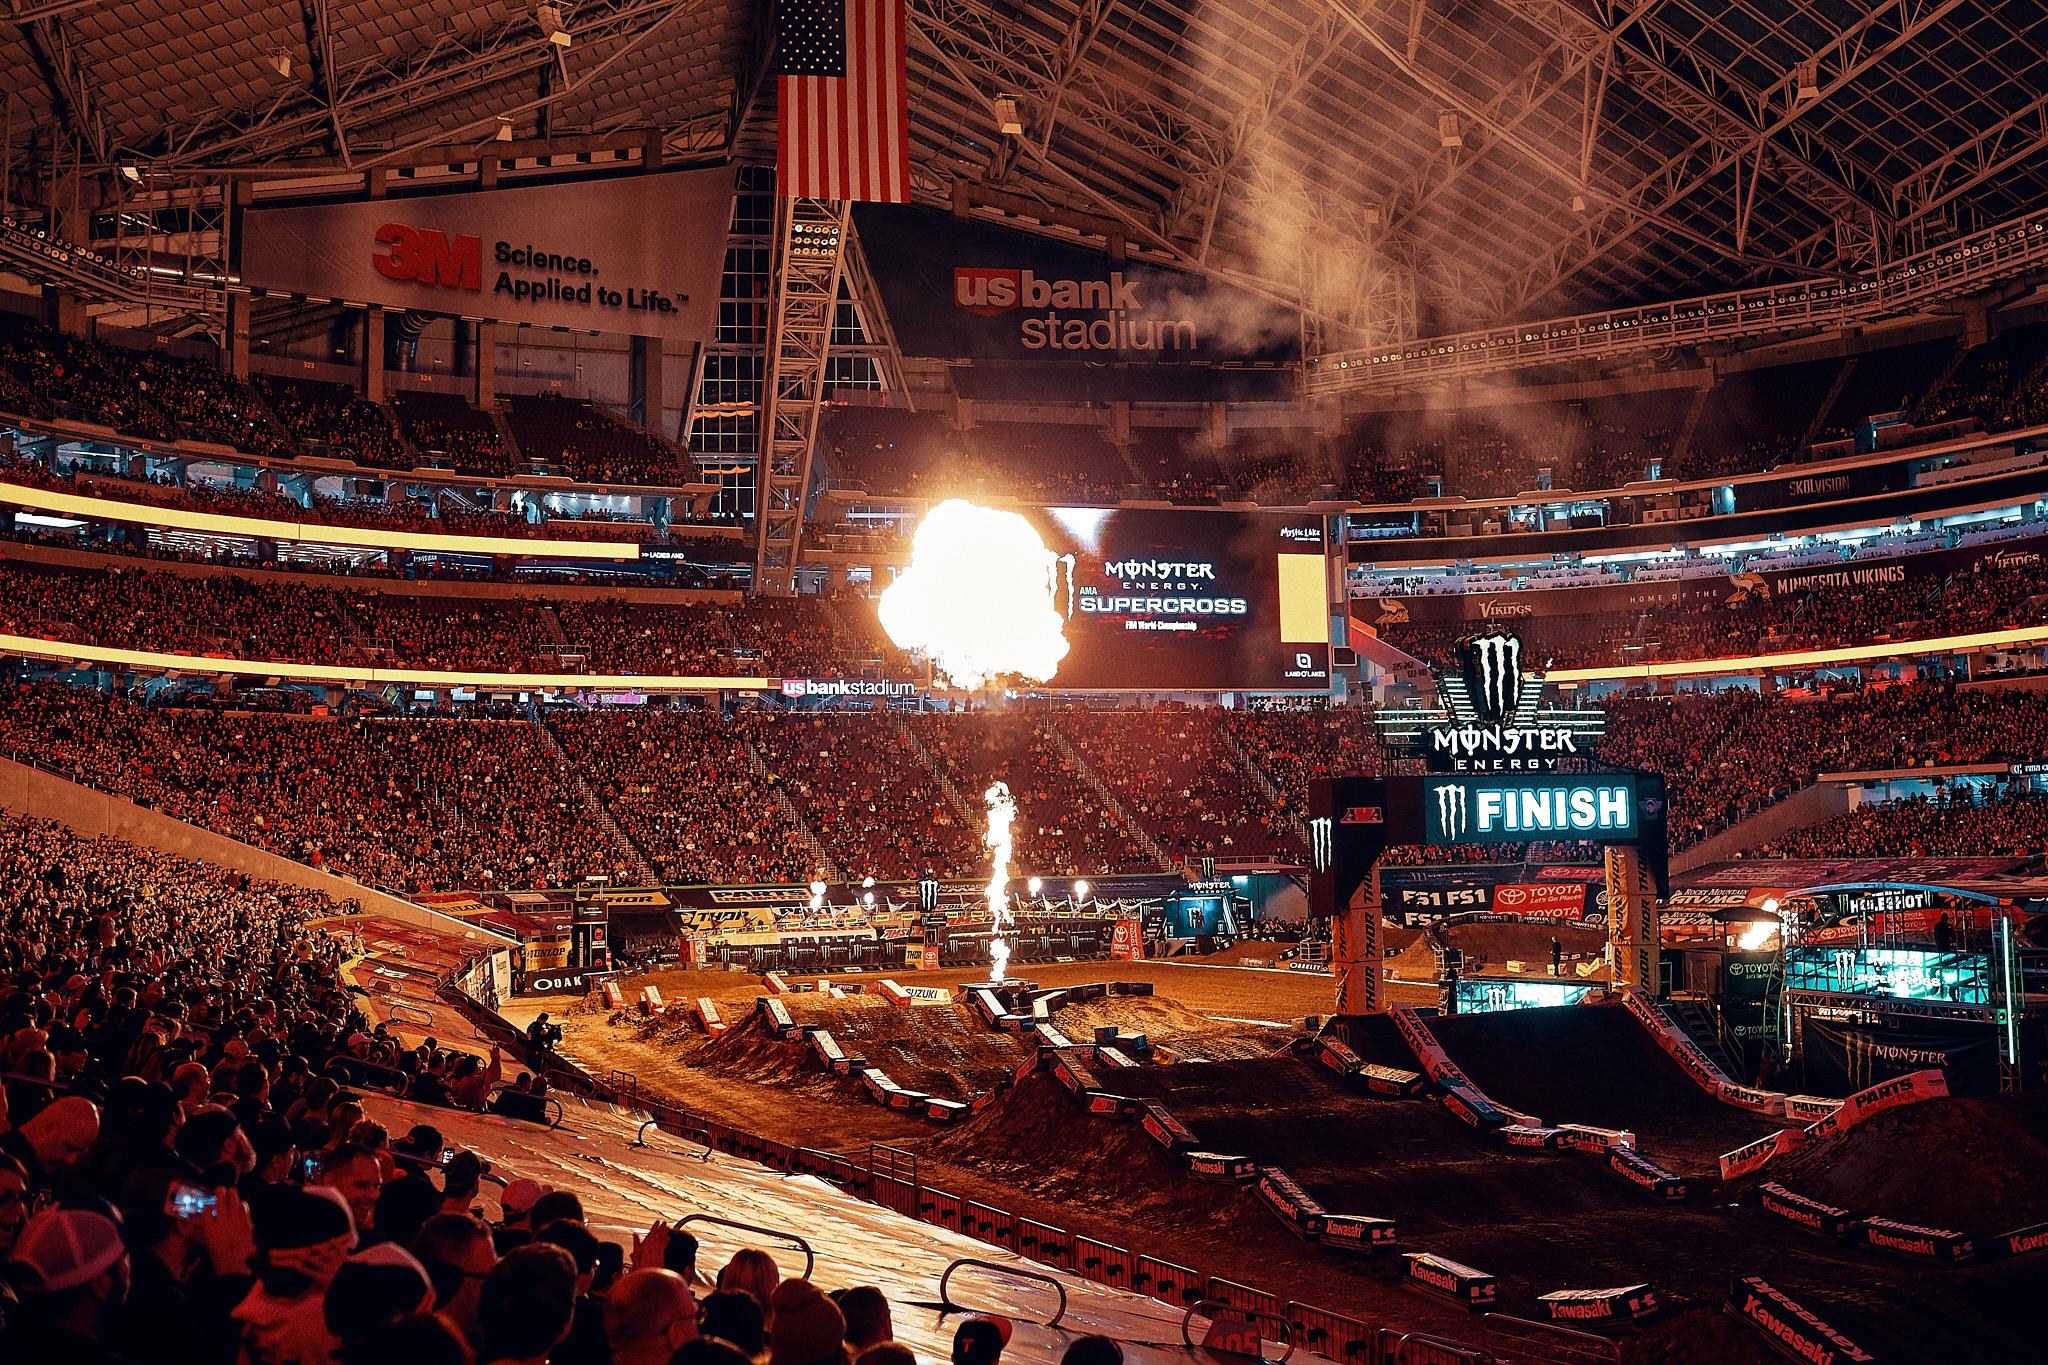 Monster_Energy_Supercross_US_Bank_Stadium_Minneapolis_Minnesota_Photography_By_Joe_Lemke_021.JPG